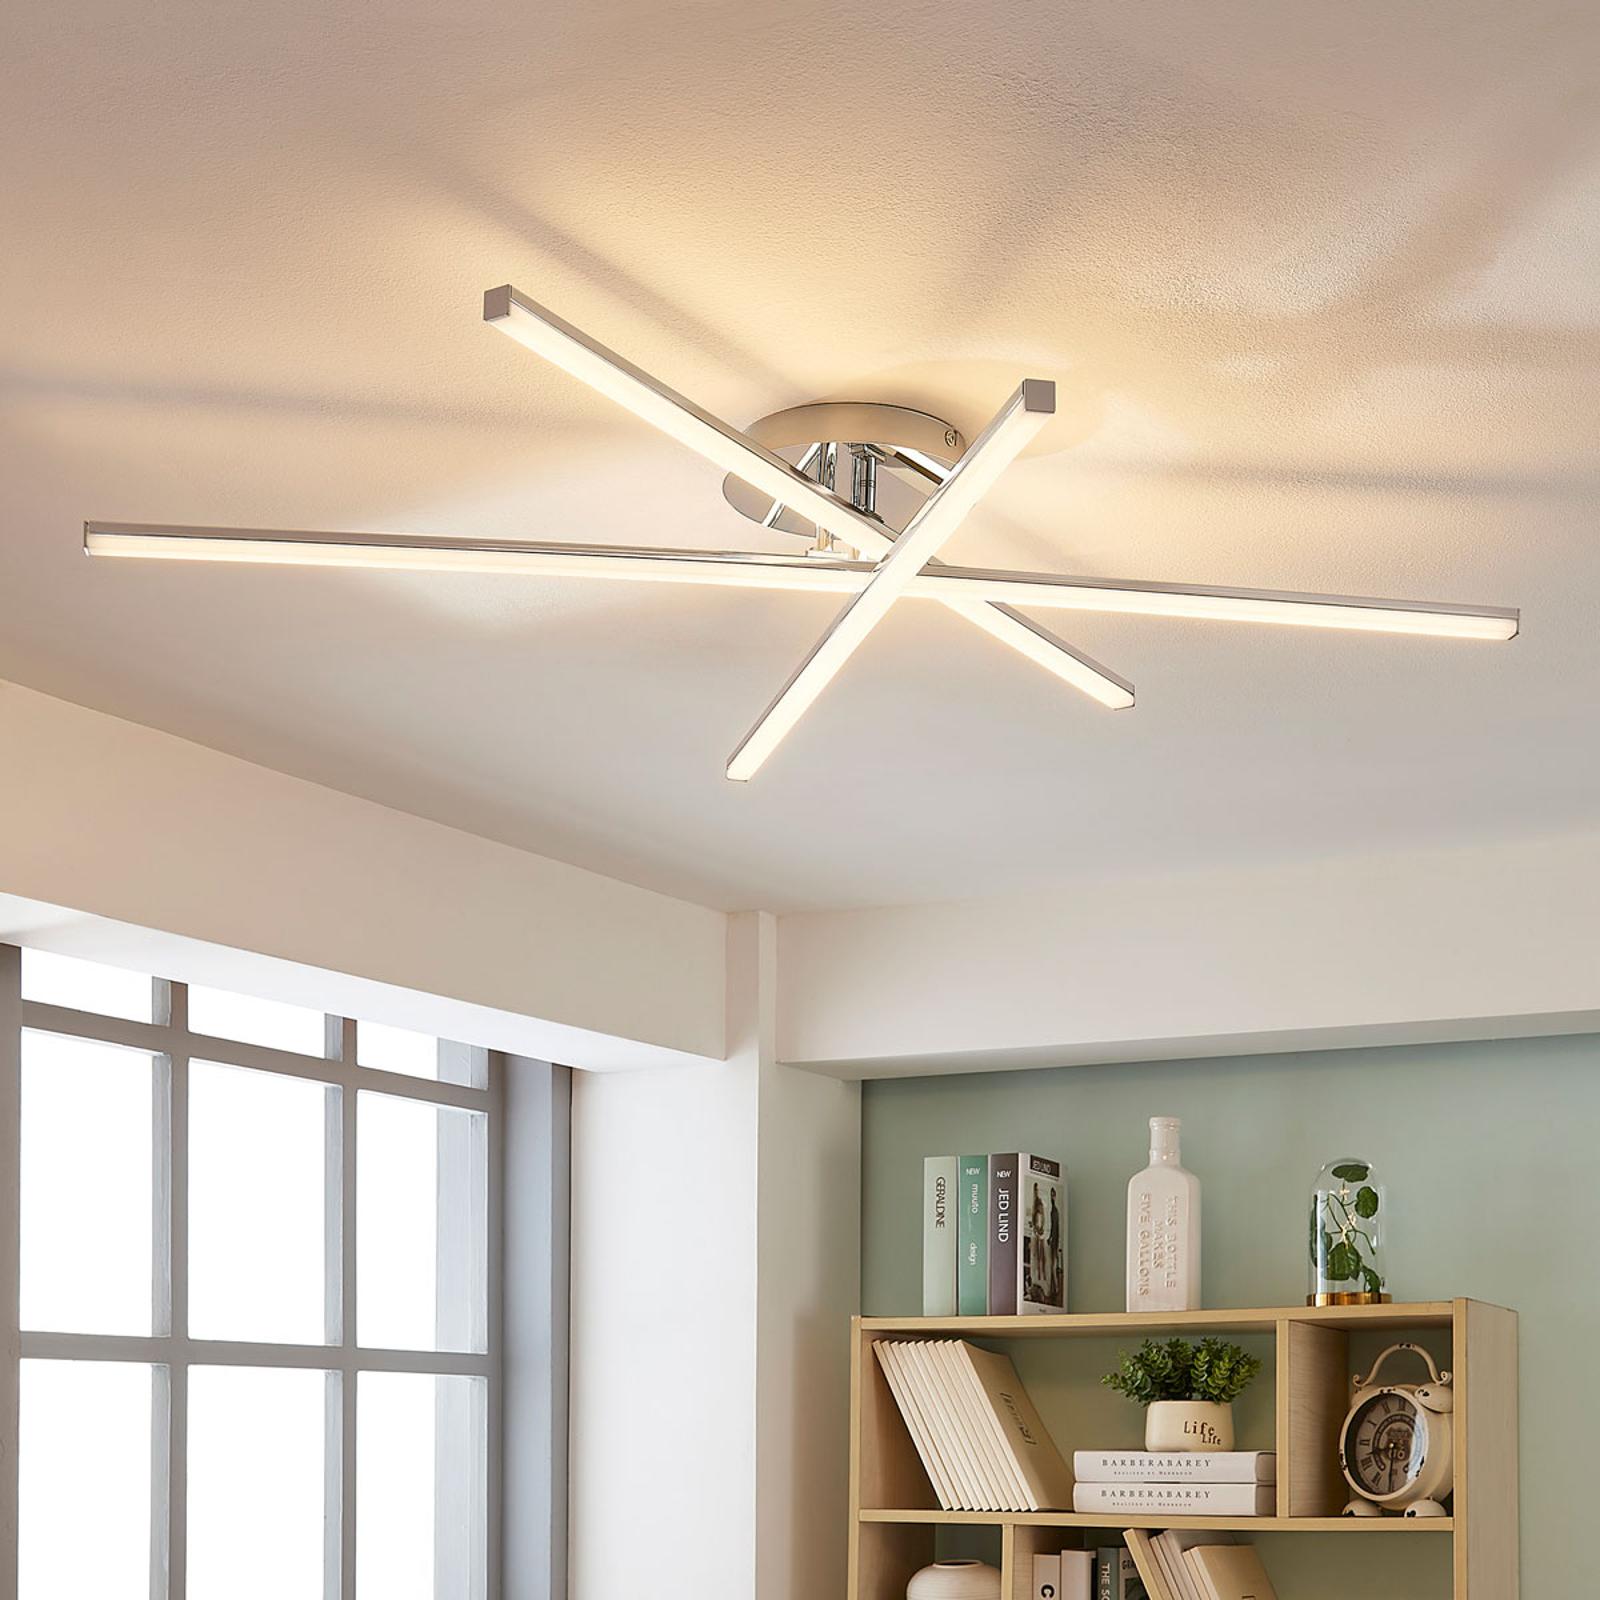 Plafonnier LED à 3 lampes Korona, variateur